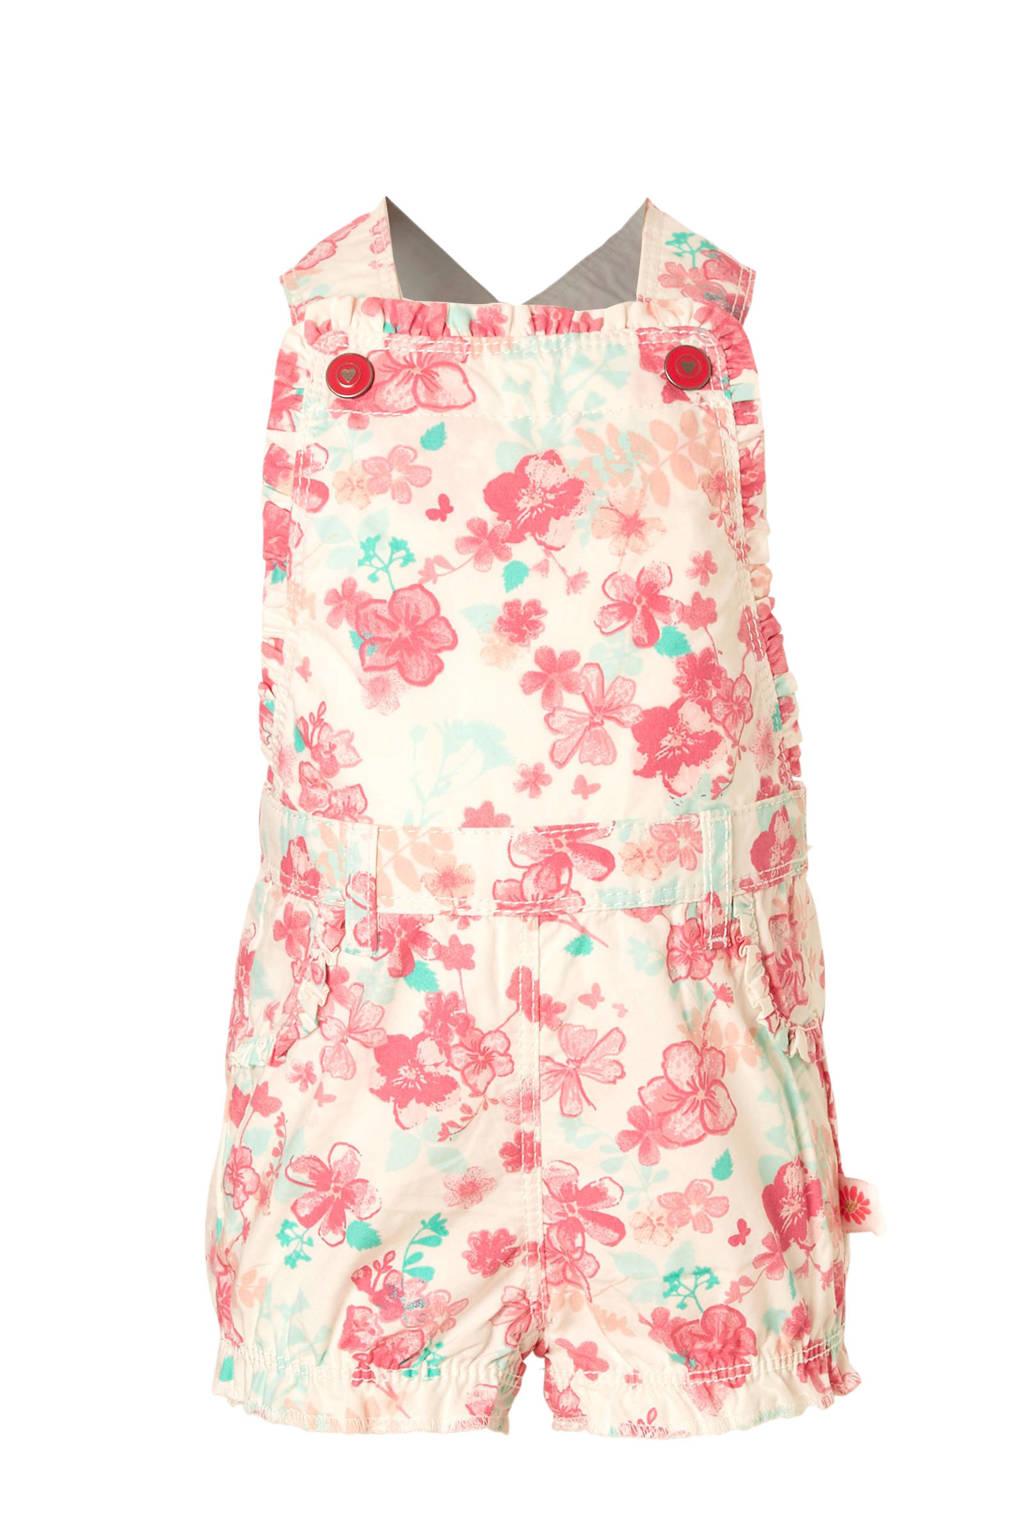 C&A Baby Club gebloemde tuinbroek wit, wit/roze/mint